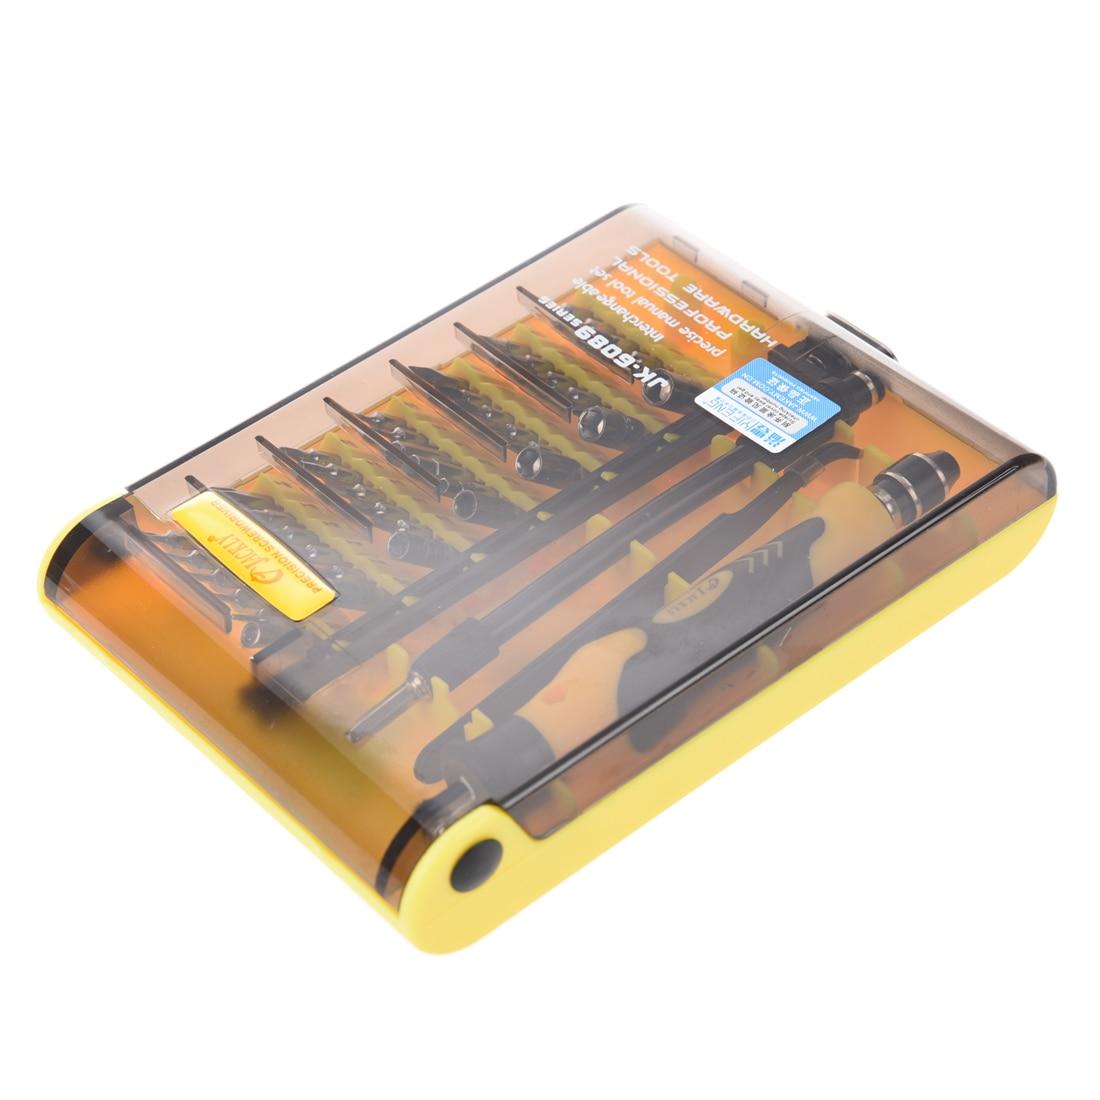 JACKLY 45-in-1 Professional Hardware Screw Driver Tool Kit JK-6089B by lodestar professional ceramic slot screw driver 0 4 x 0 9mm